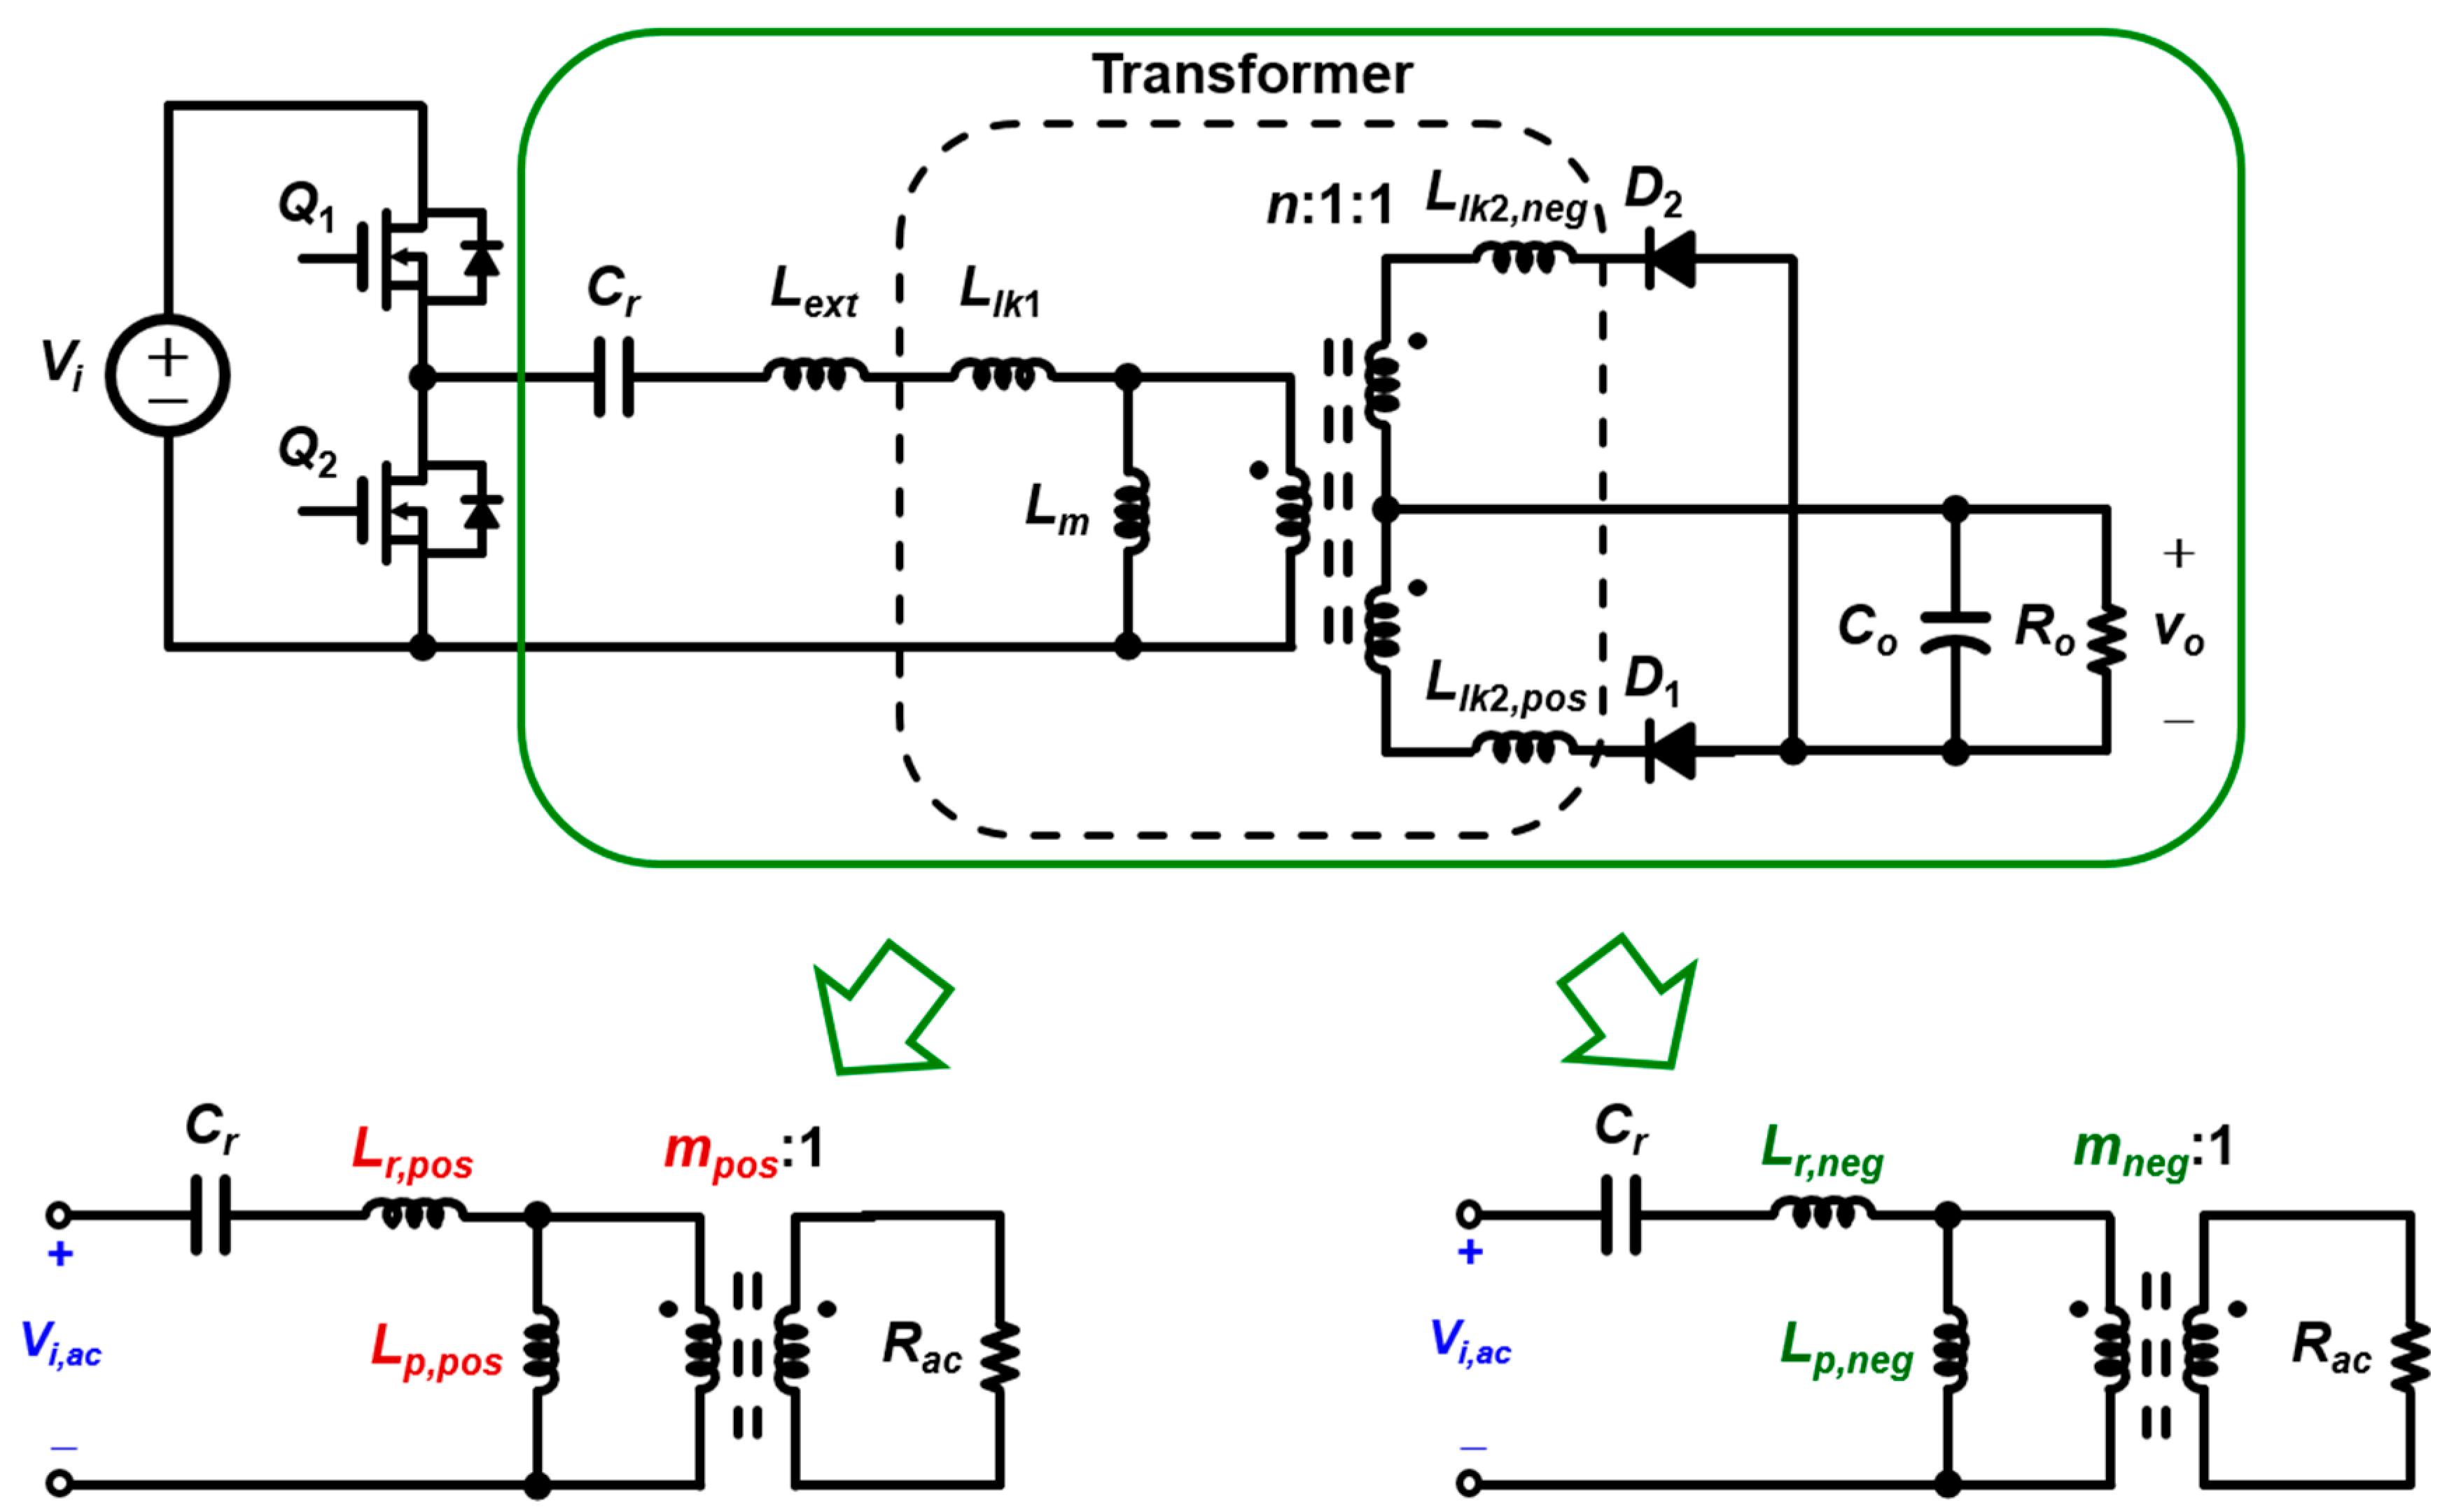 Ad C2000 Crossover Wiring Diagram